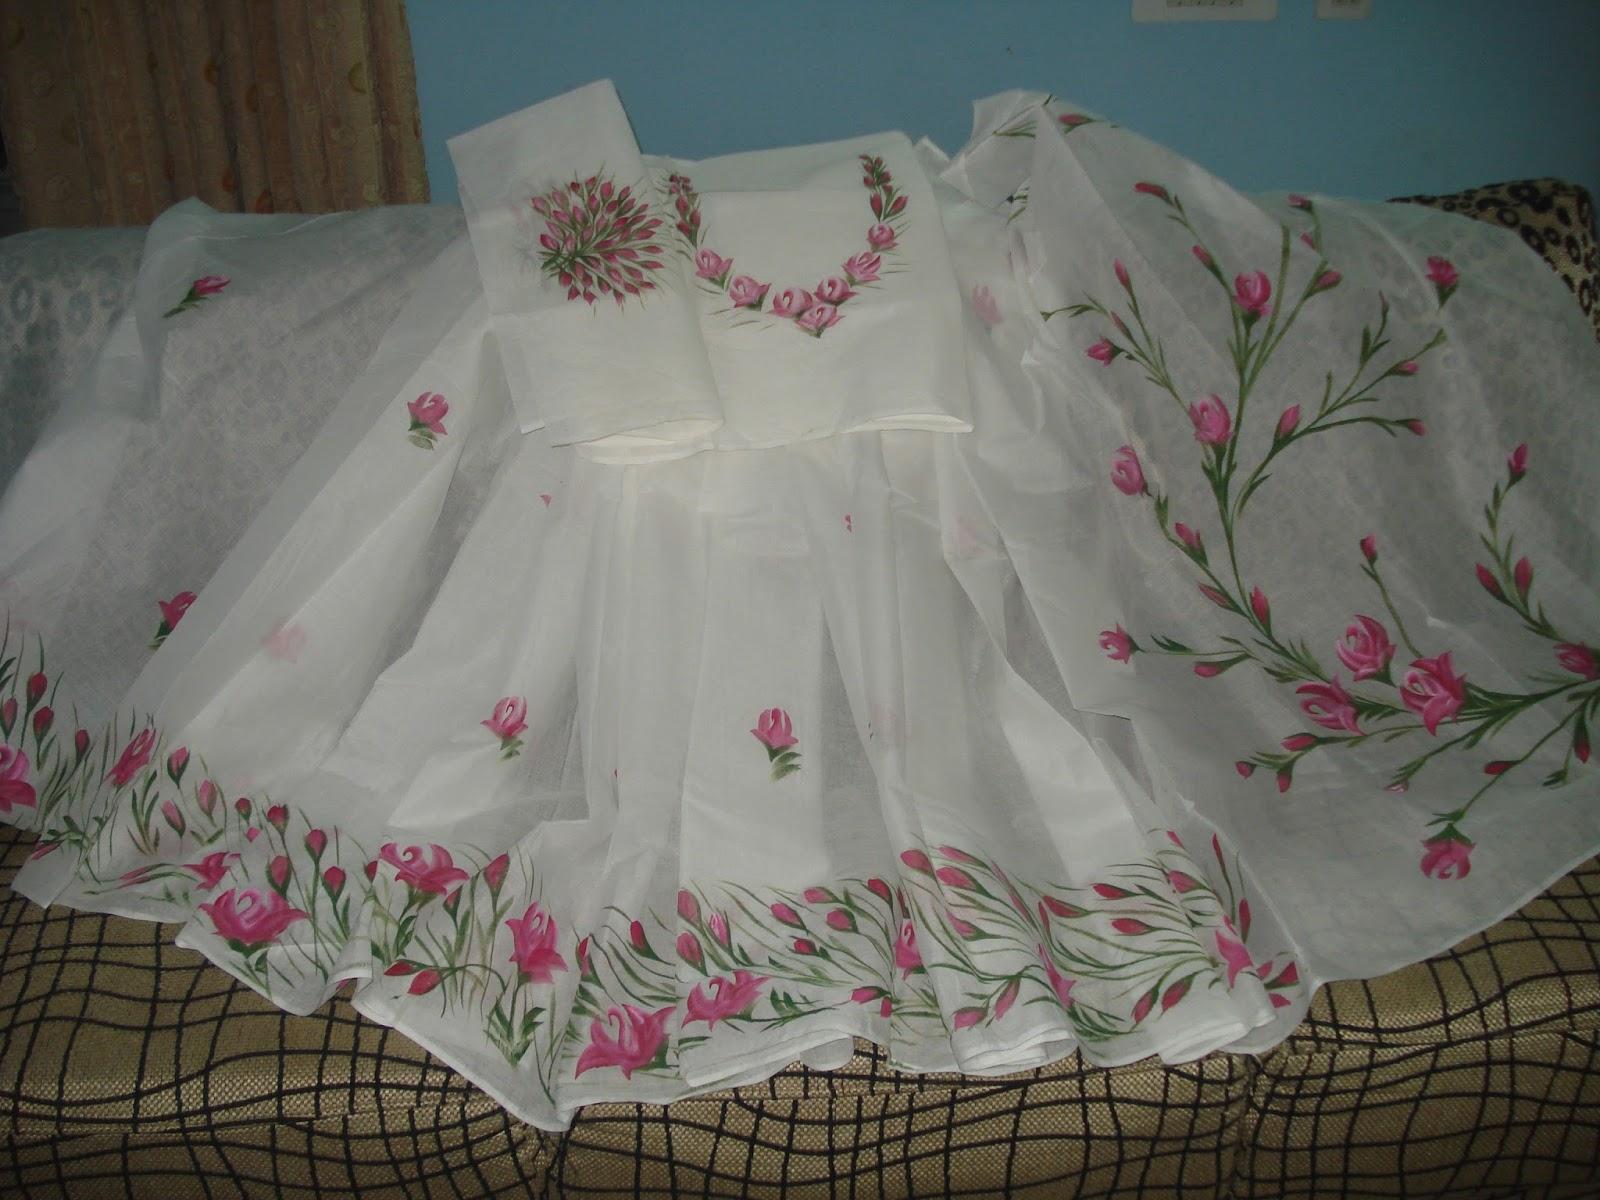 new design   fabric painting on sarees /dress/tops..... for Fabric Painting Designs On White Kurtis  585hul